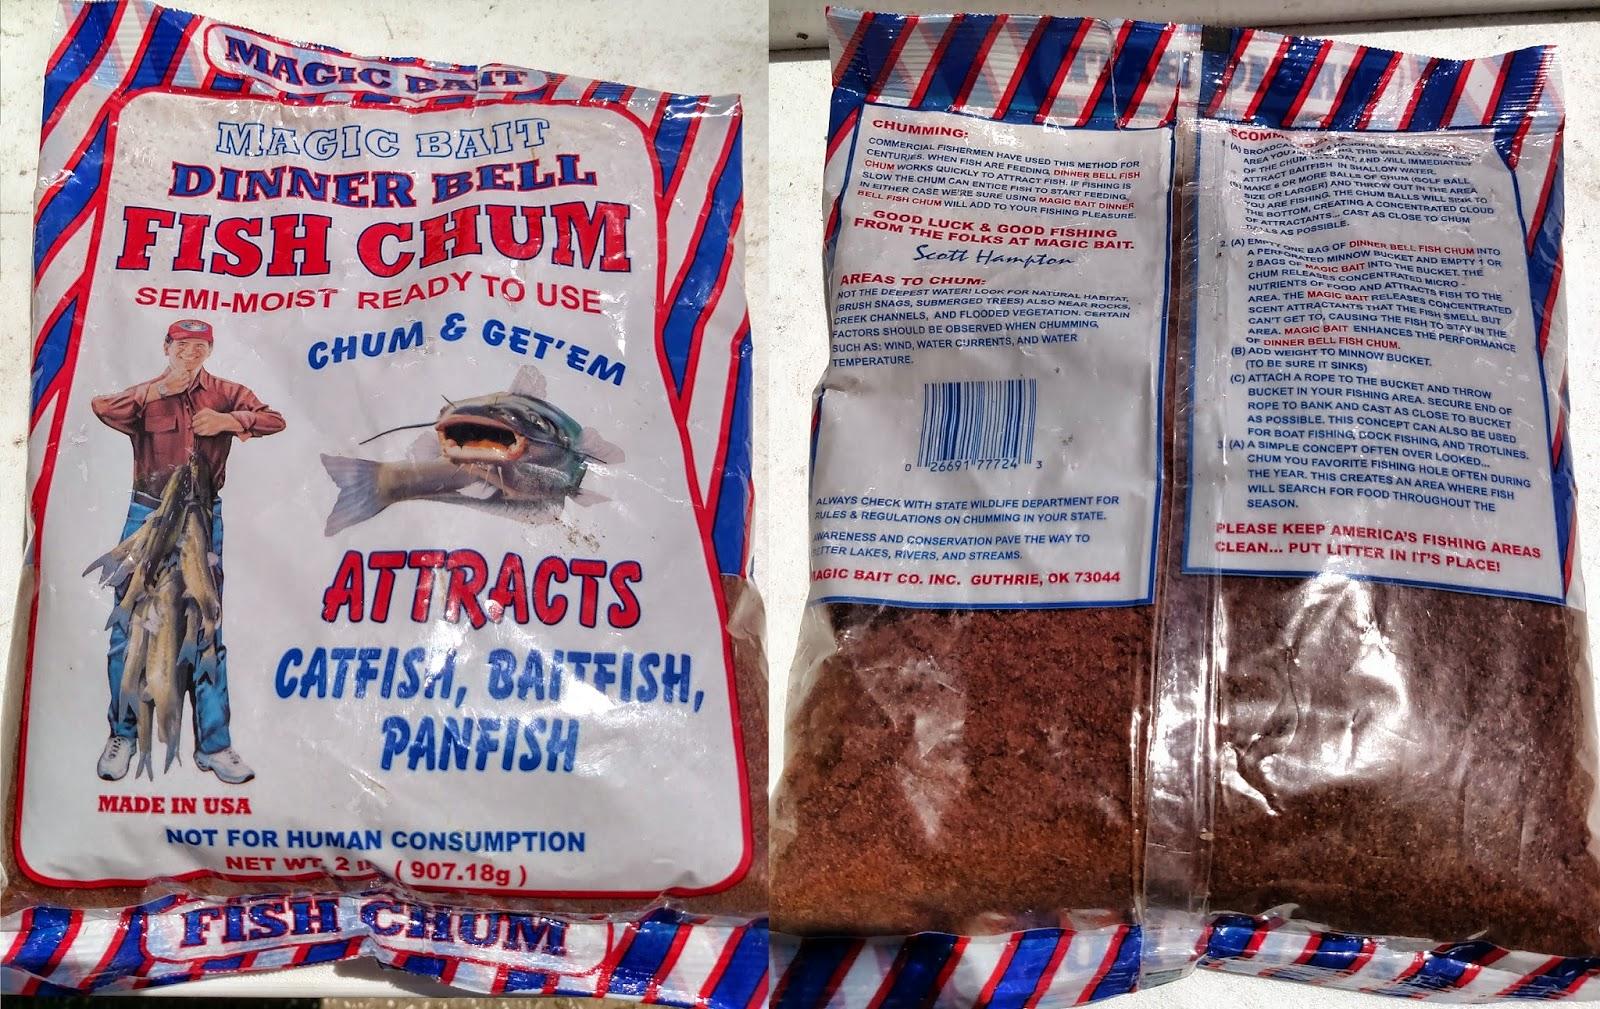 Review: Magic Bait Dinner Bell Fish Chum (Catfish)